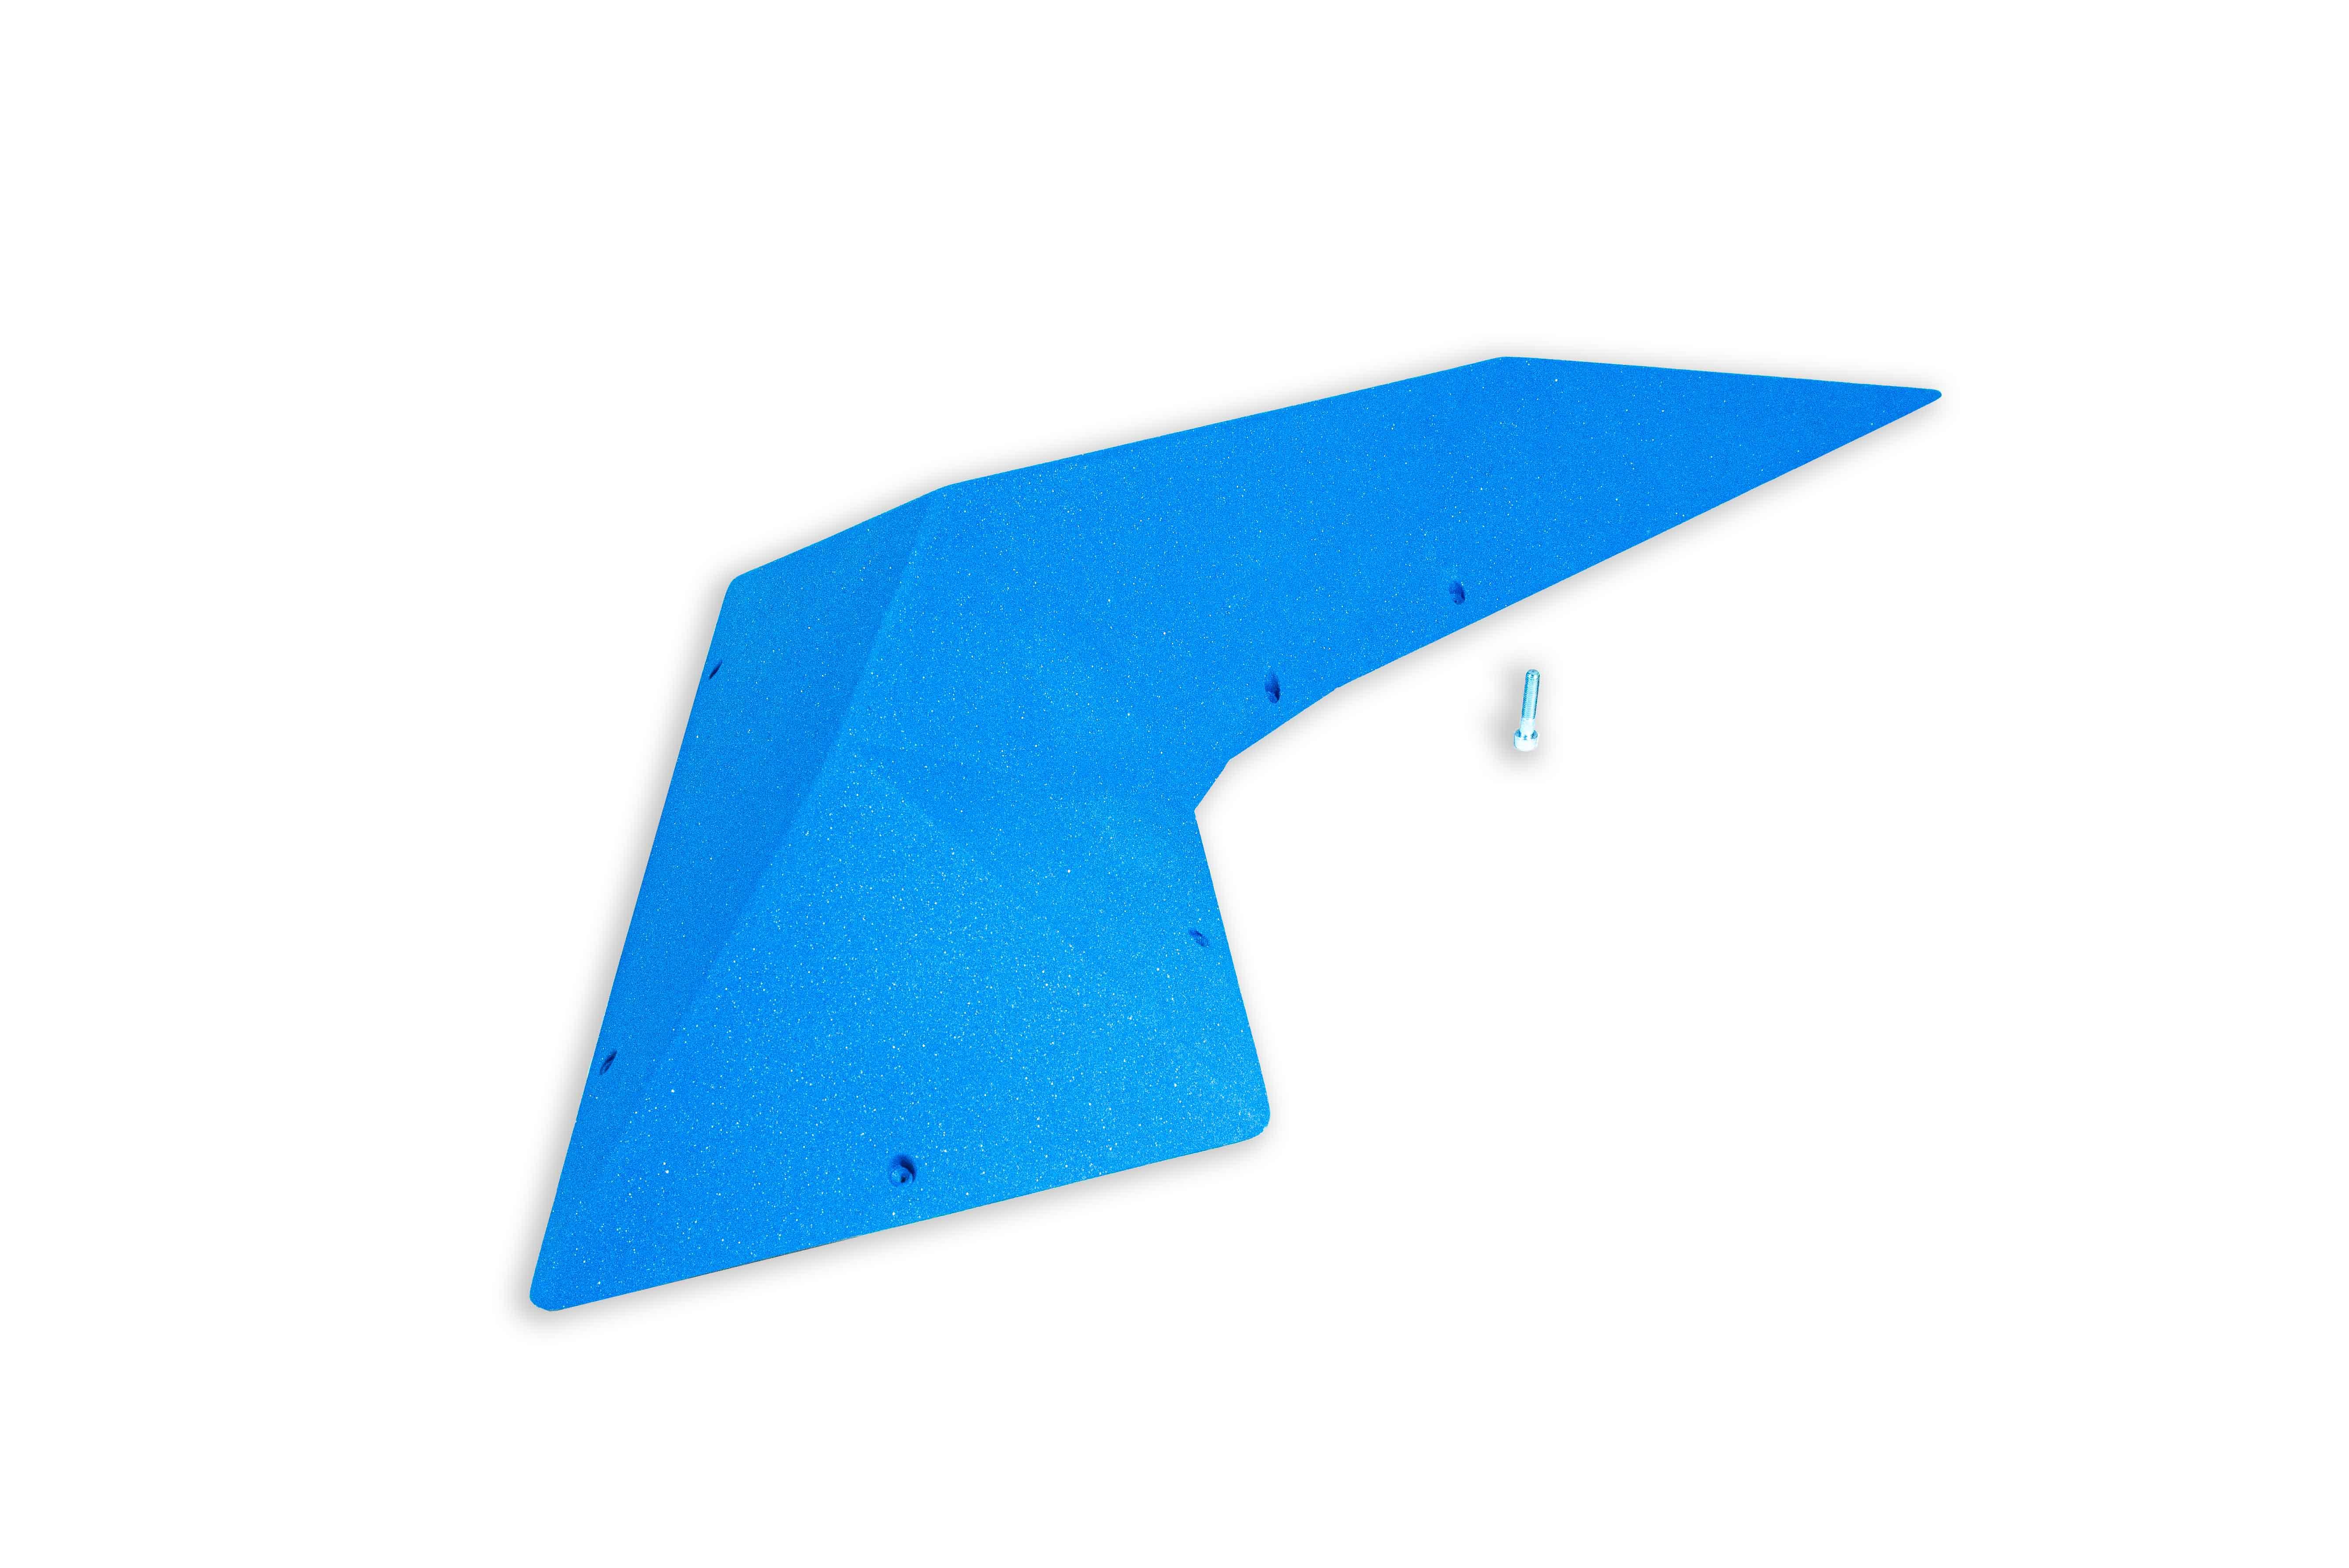 BluePill - Bad Wing 1500 R